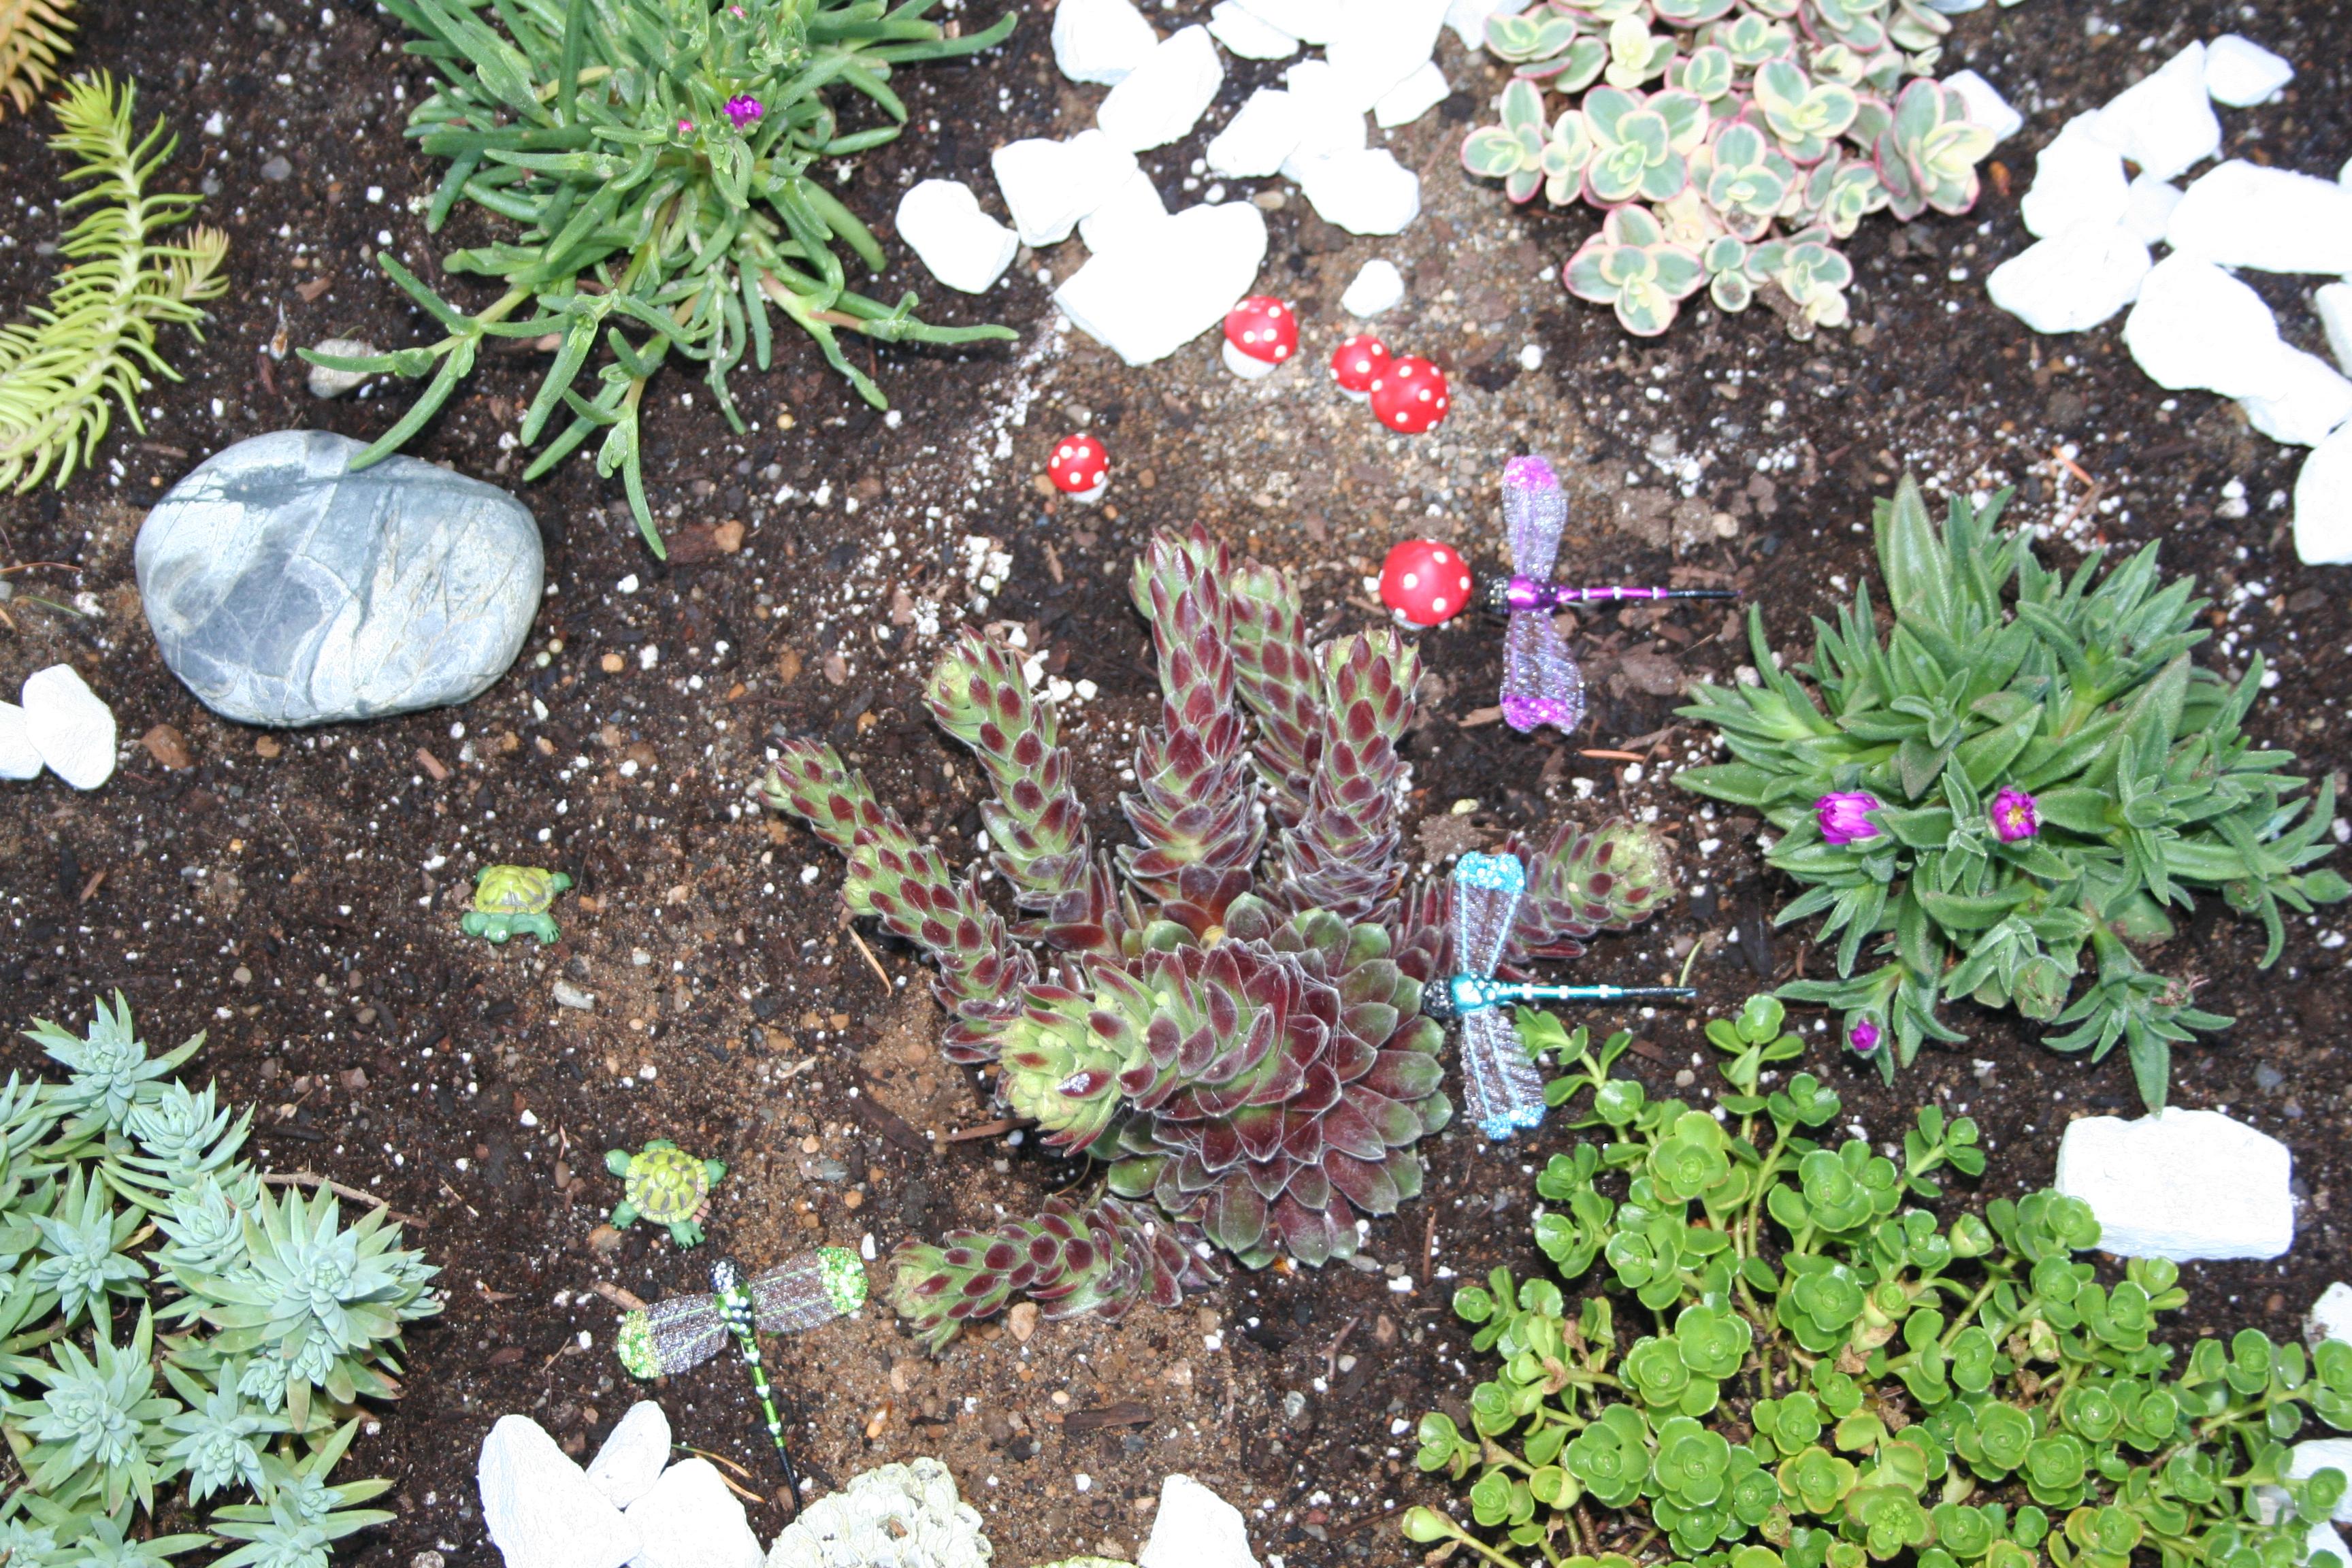 Images Gratuites Succulentes Jardin Miniature Libellules Plante